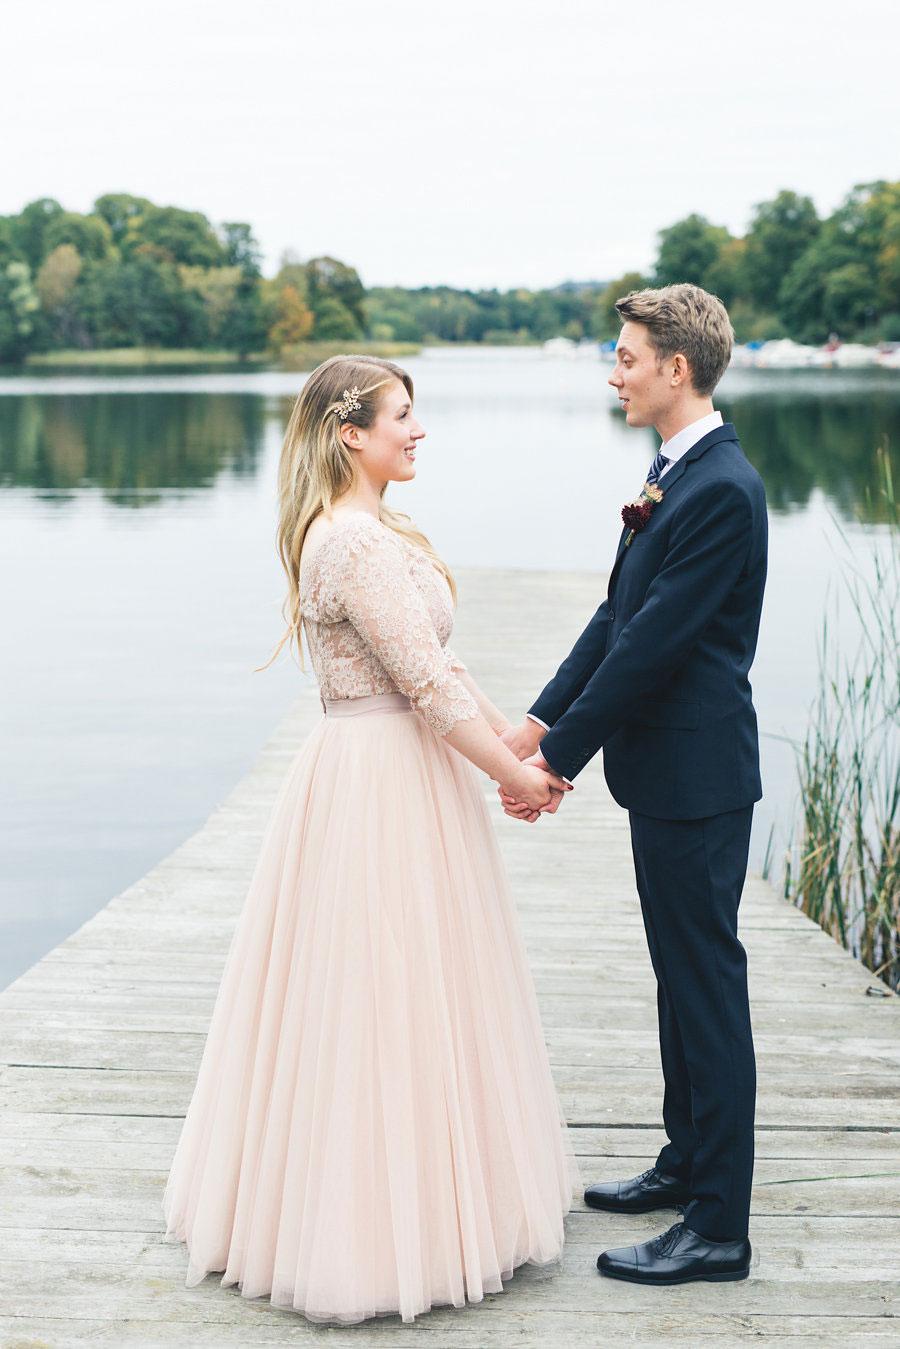 Beautiful Blush Bridal Separates For A Candlelit Autumn Wedding ...